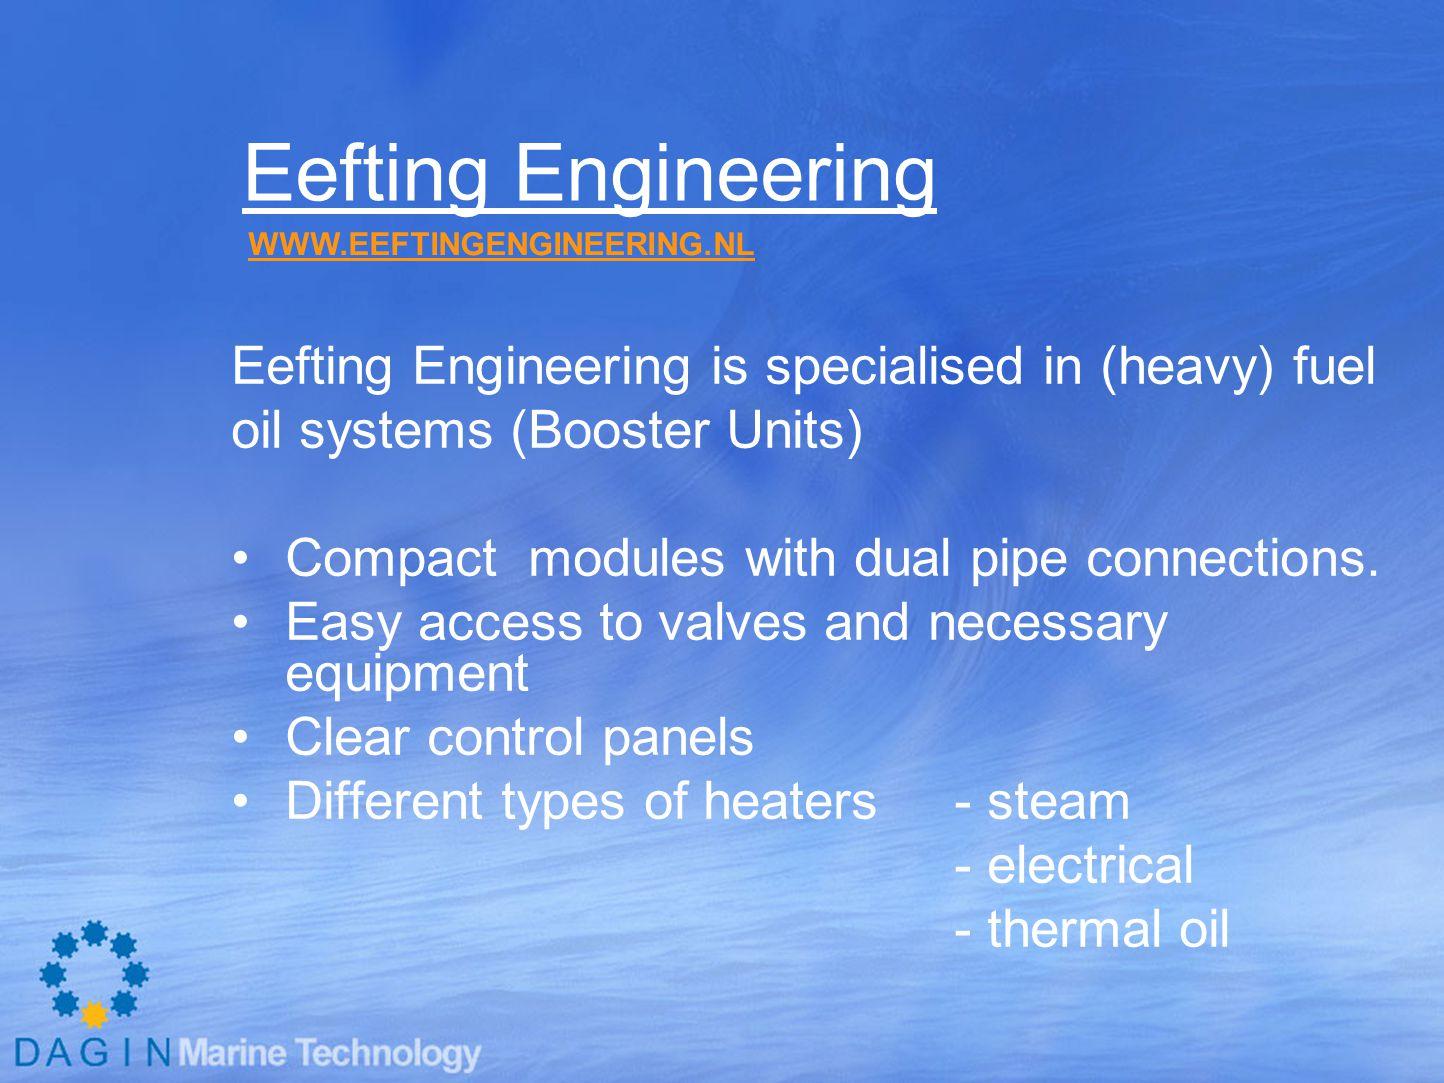 Eefting Engineering Eefting Engineering is specialised in (heavy) fuel